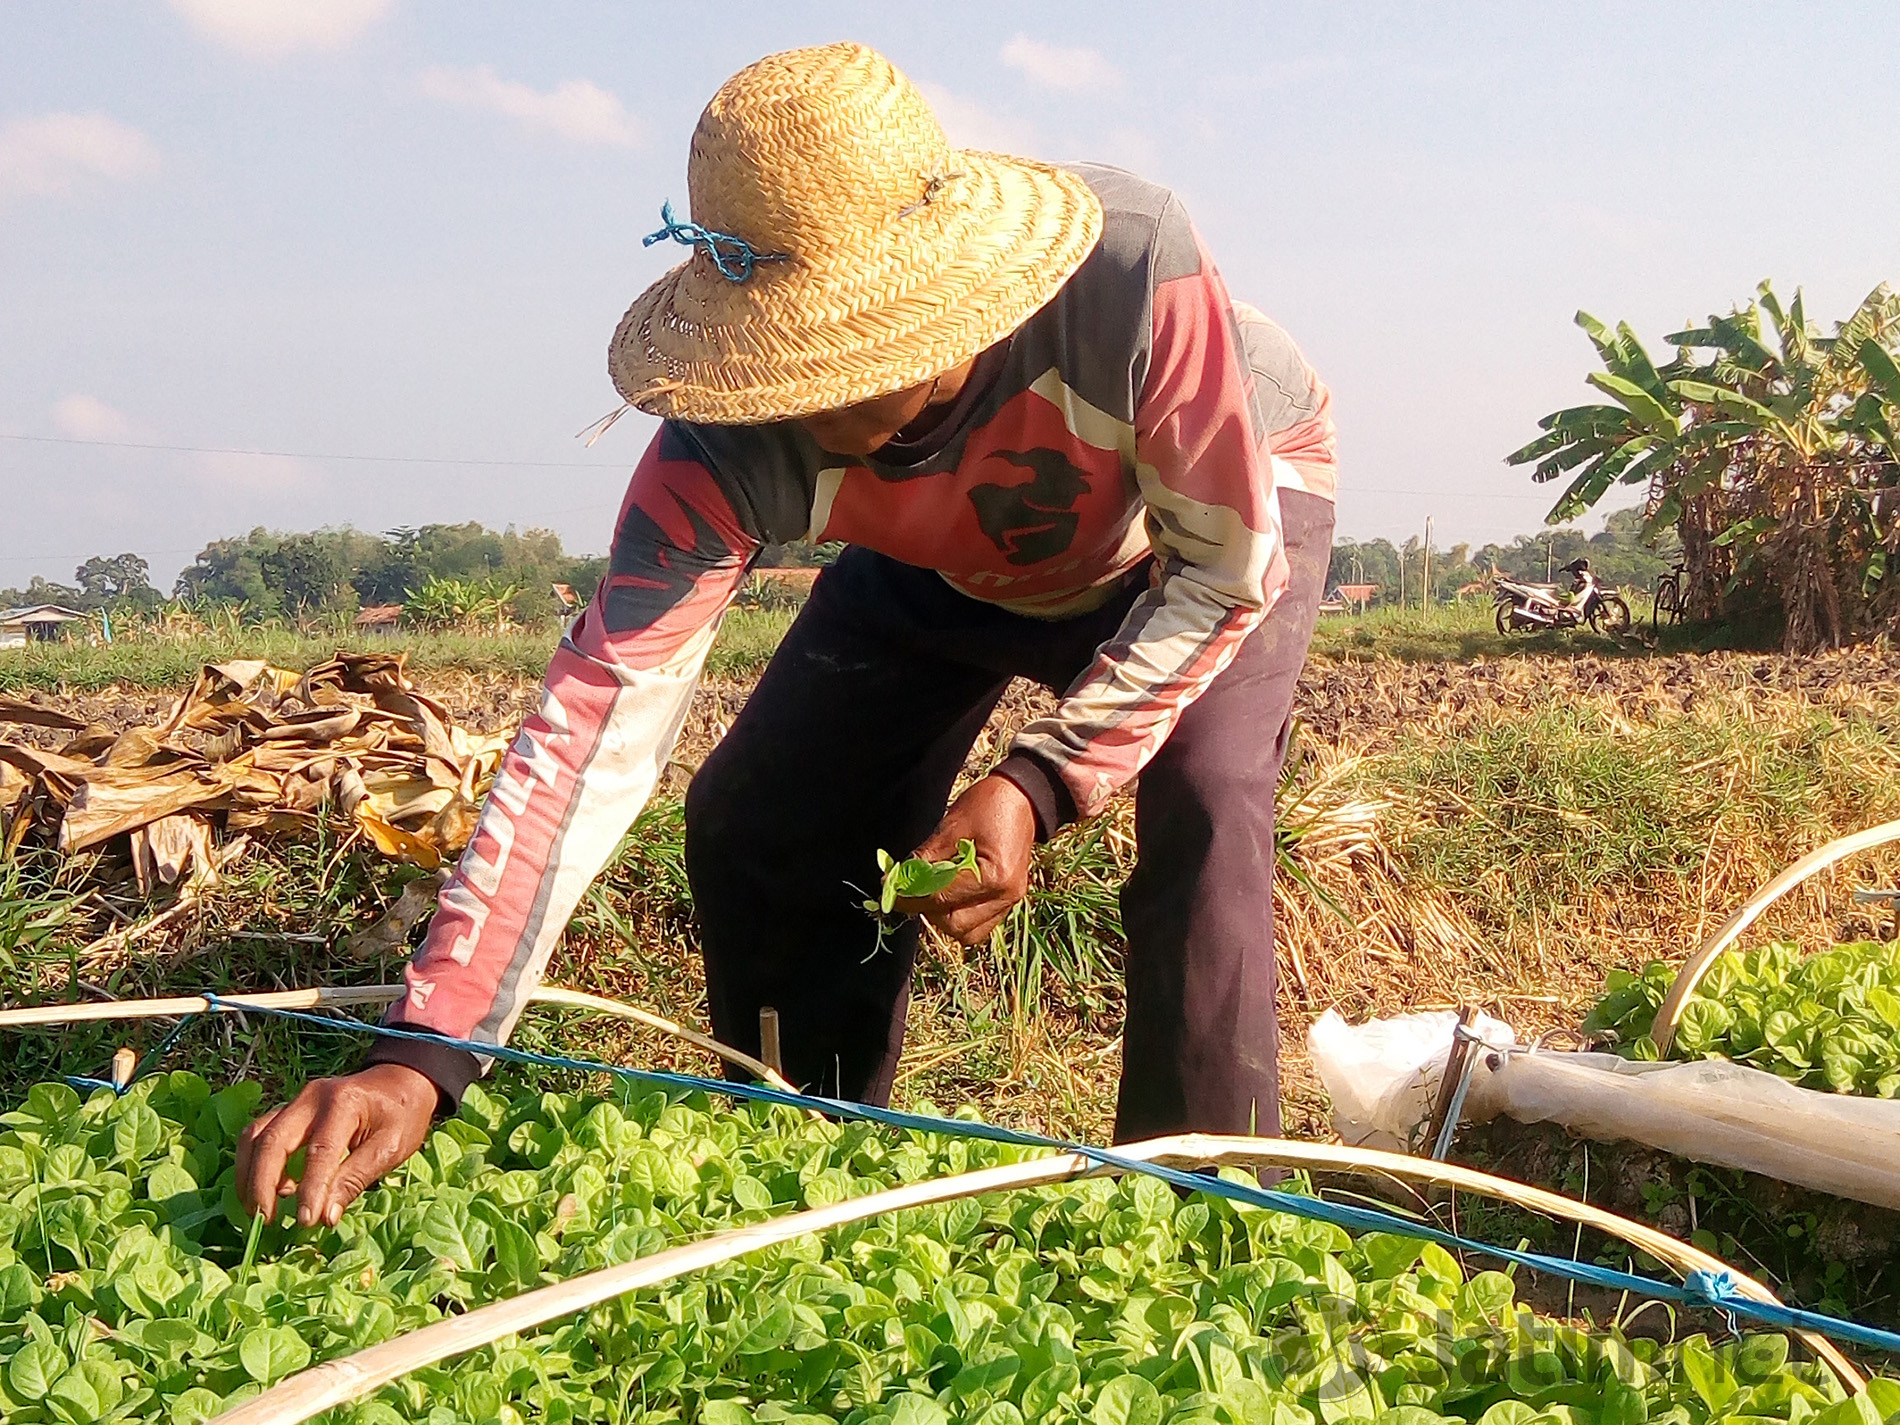 Kalteng Cari Transmigran Ke Tiga Provinsi di Pulau Jawa